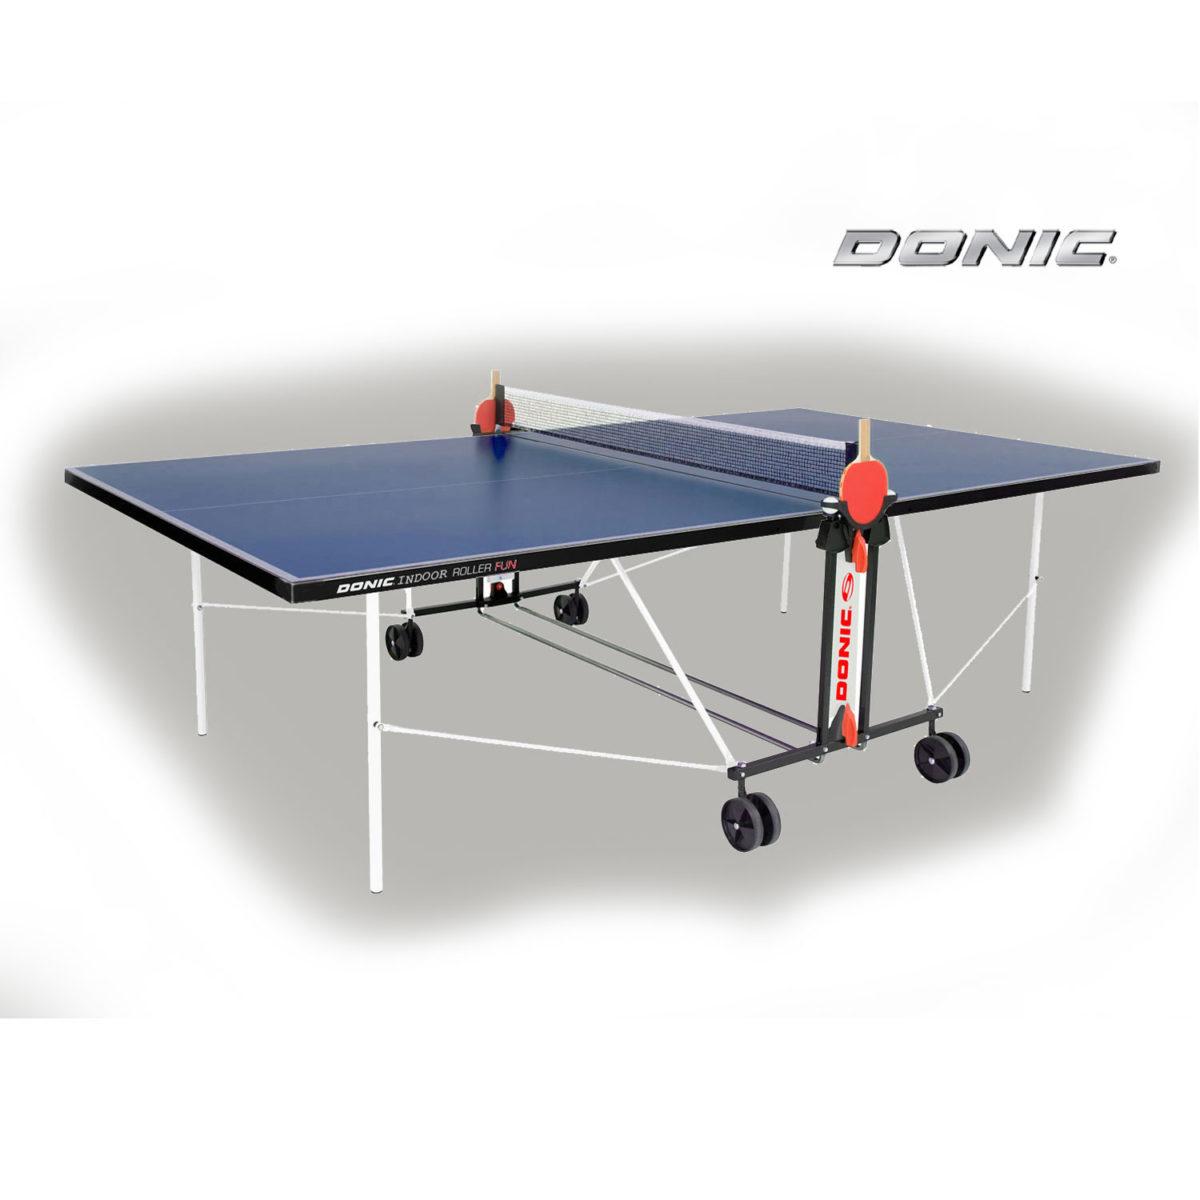 Теннисный стол DONIC INDOOR ROLLER FUN BLUE 19мм-арт-230235-B-DONIC